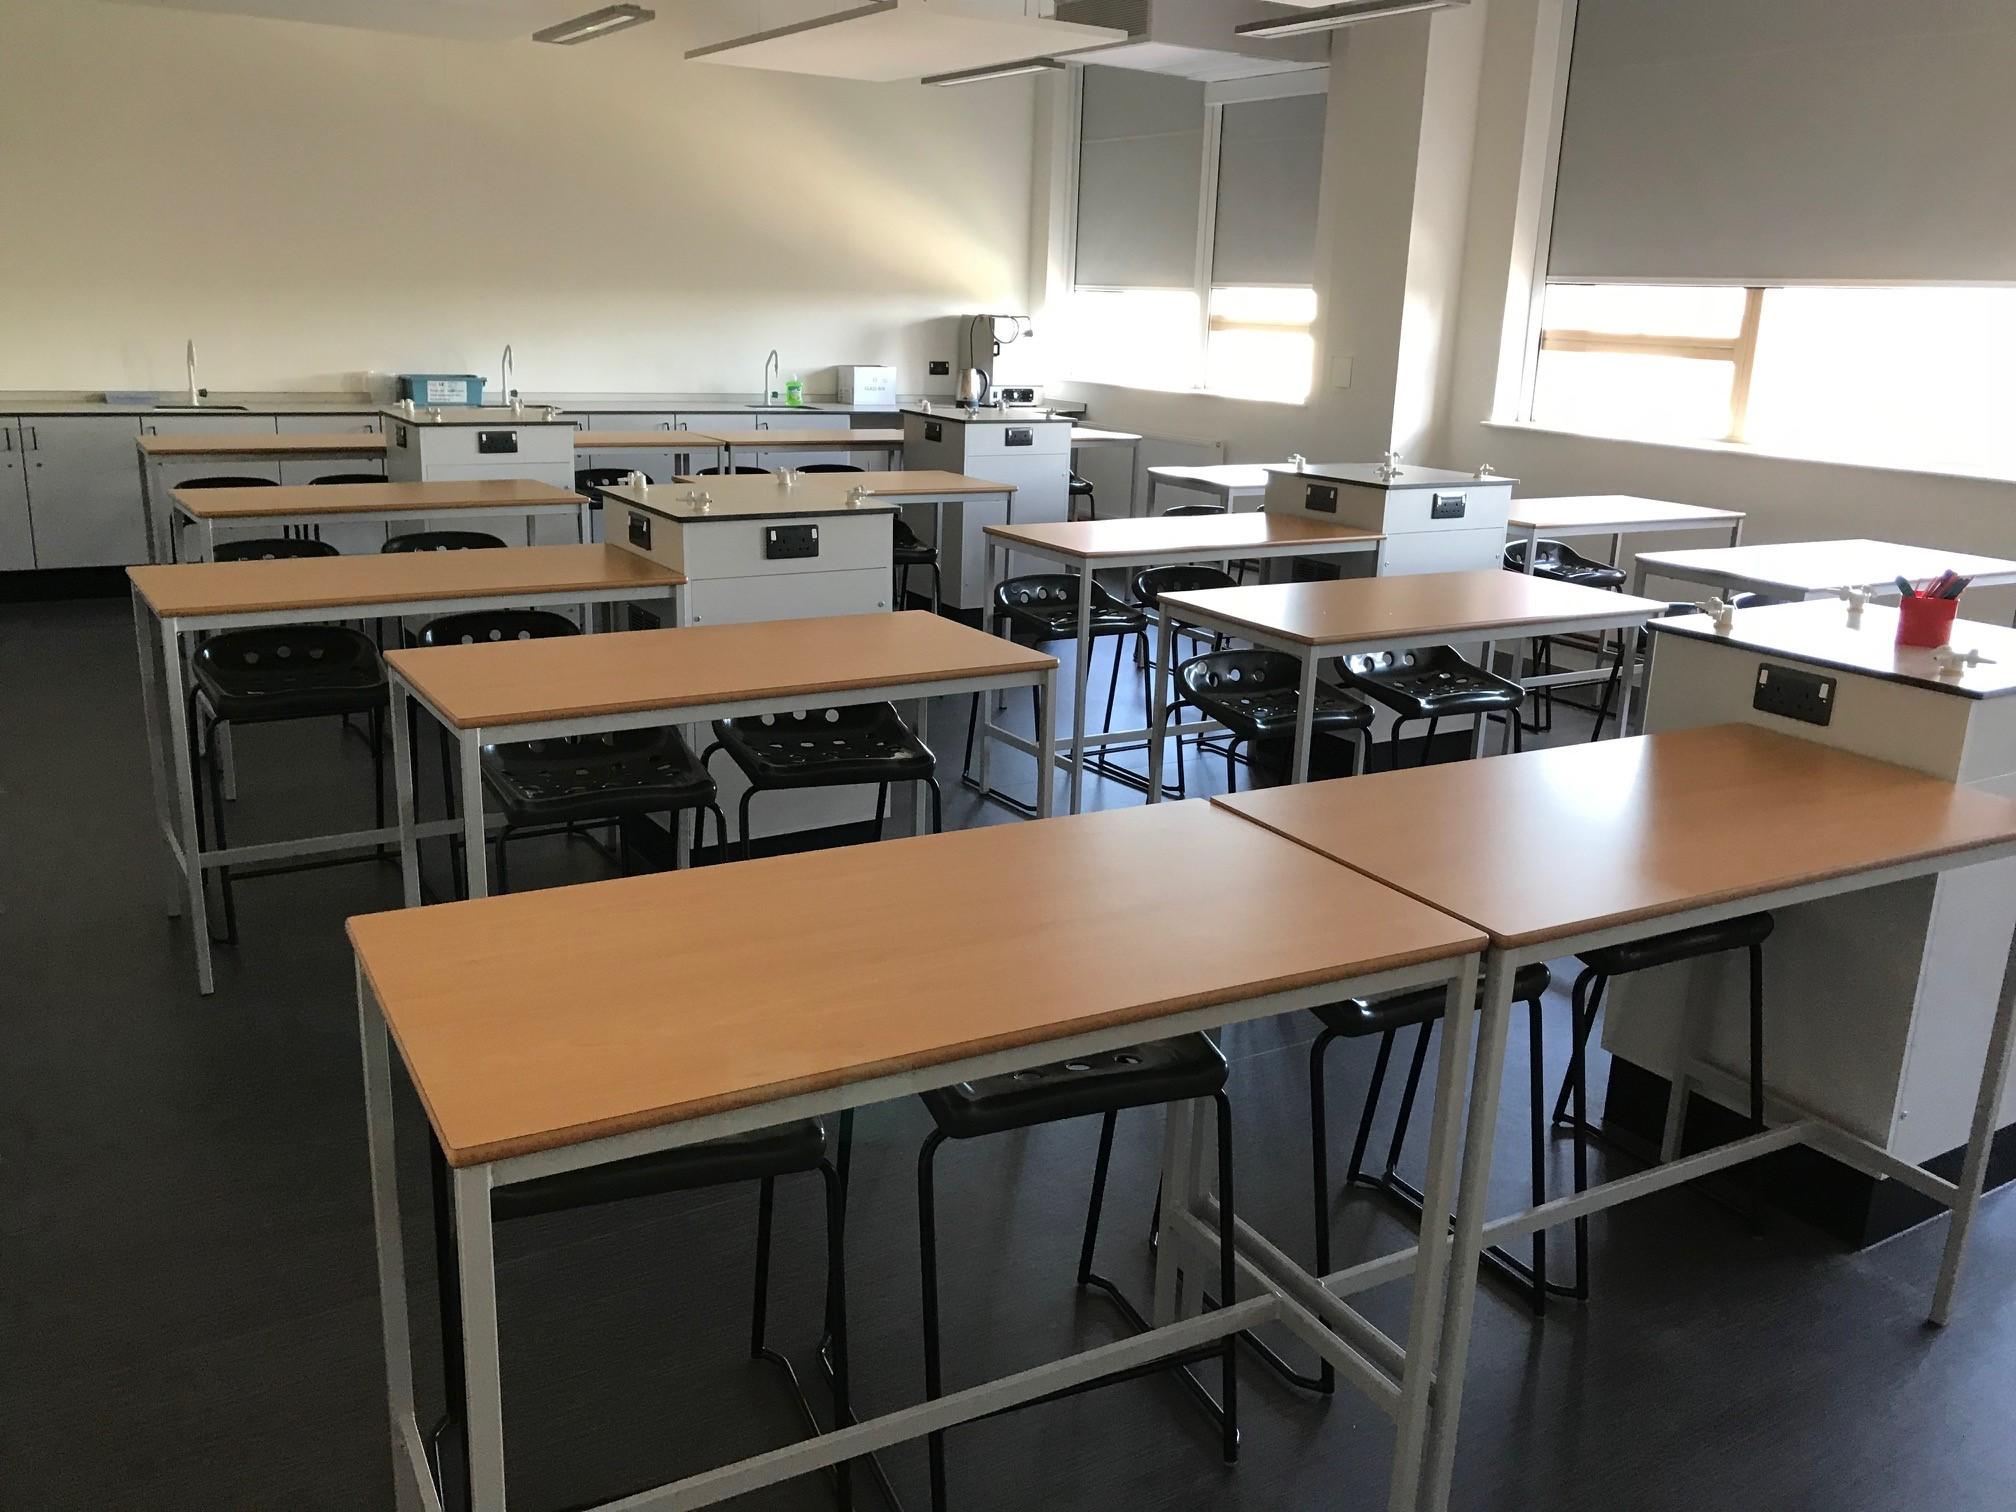 Furniture Installation Meopham School, Kent